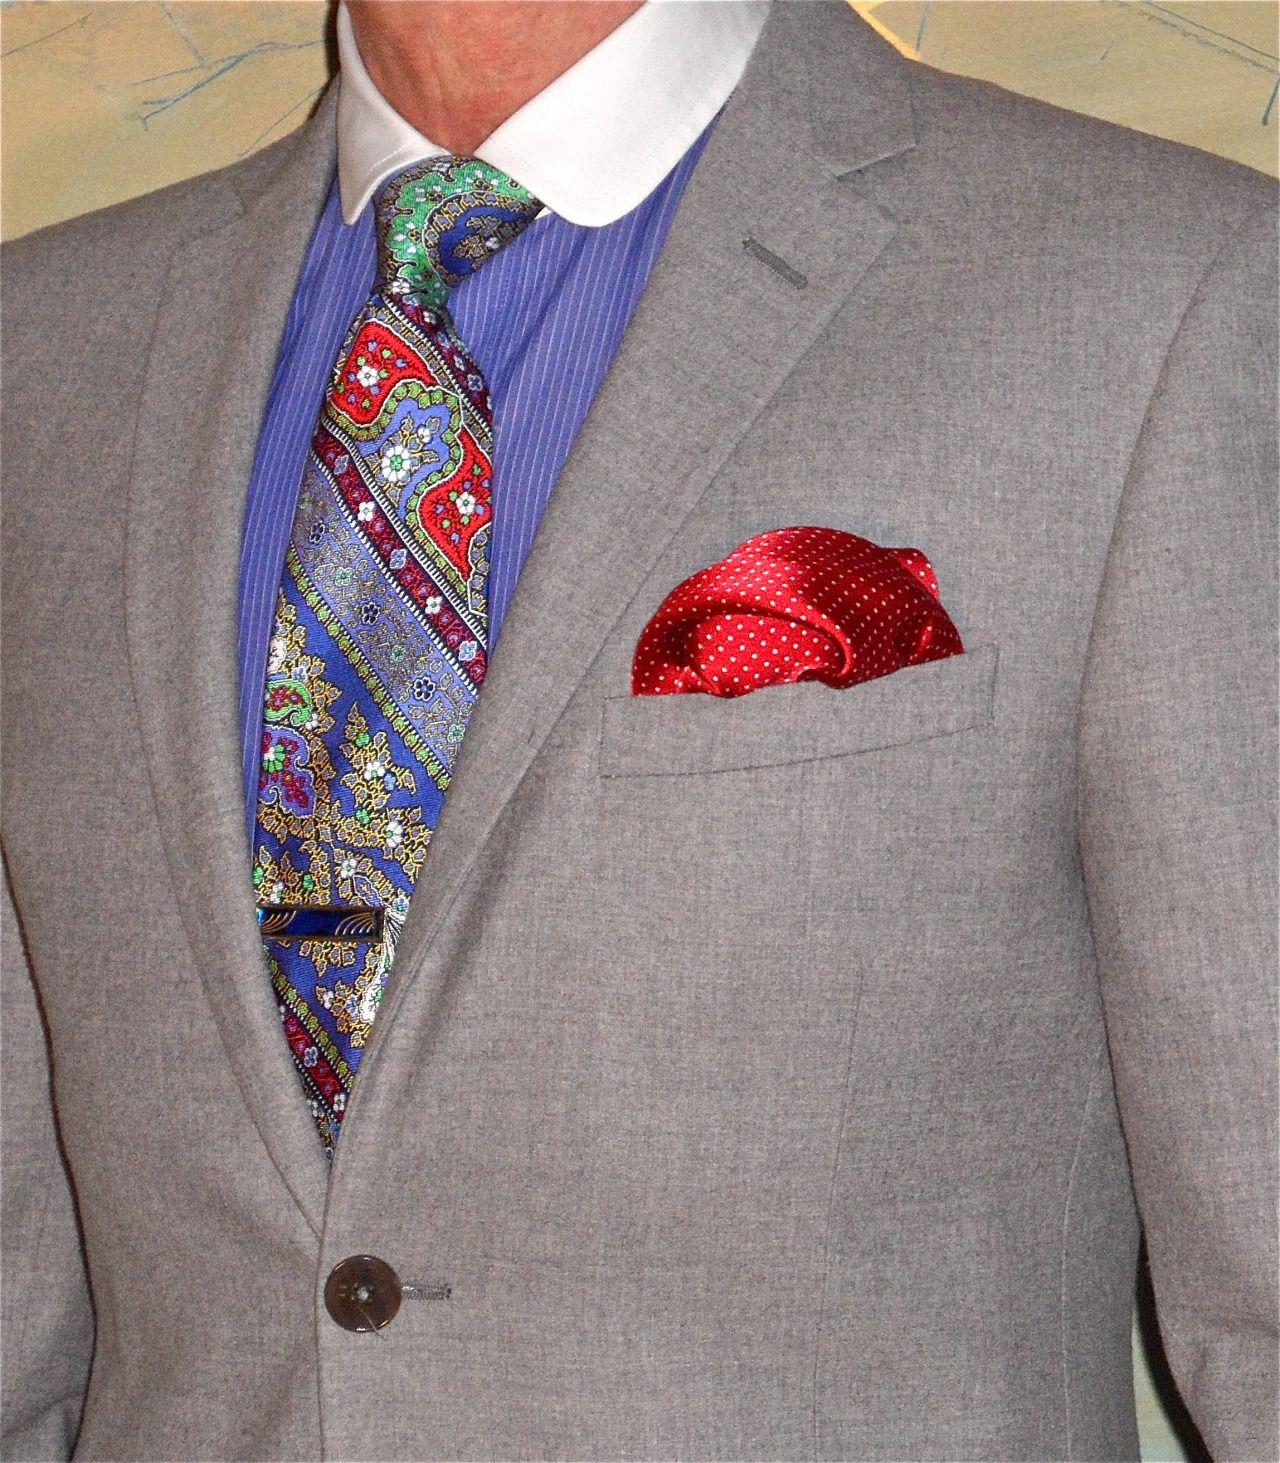 Flannel shirt under suit  Hilton grey flannel suit Mods of Norway shirt Ralph Lauren tie